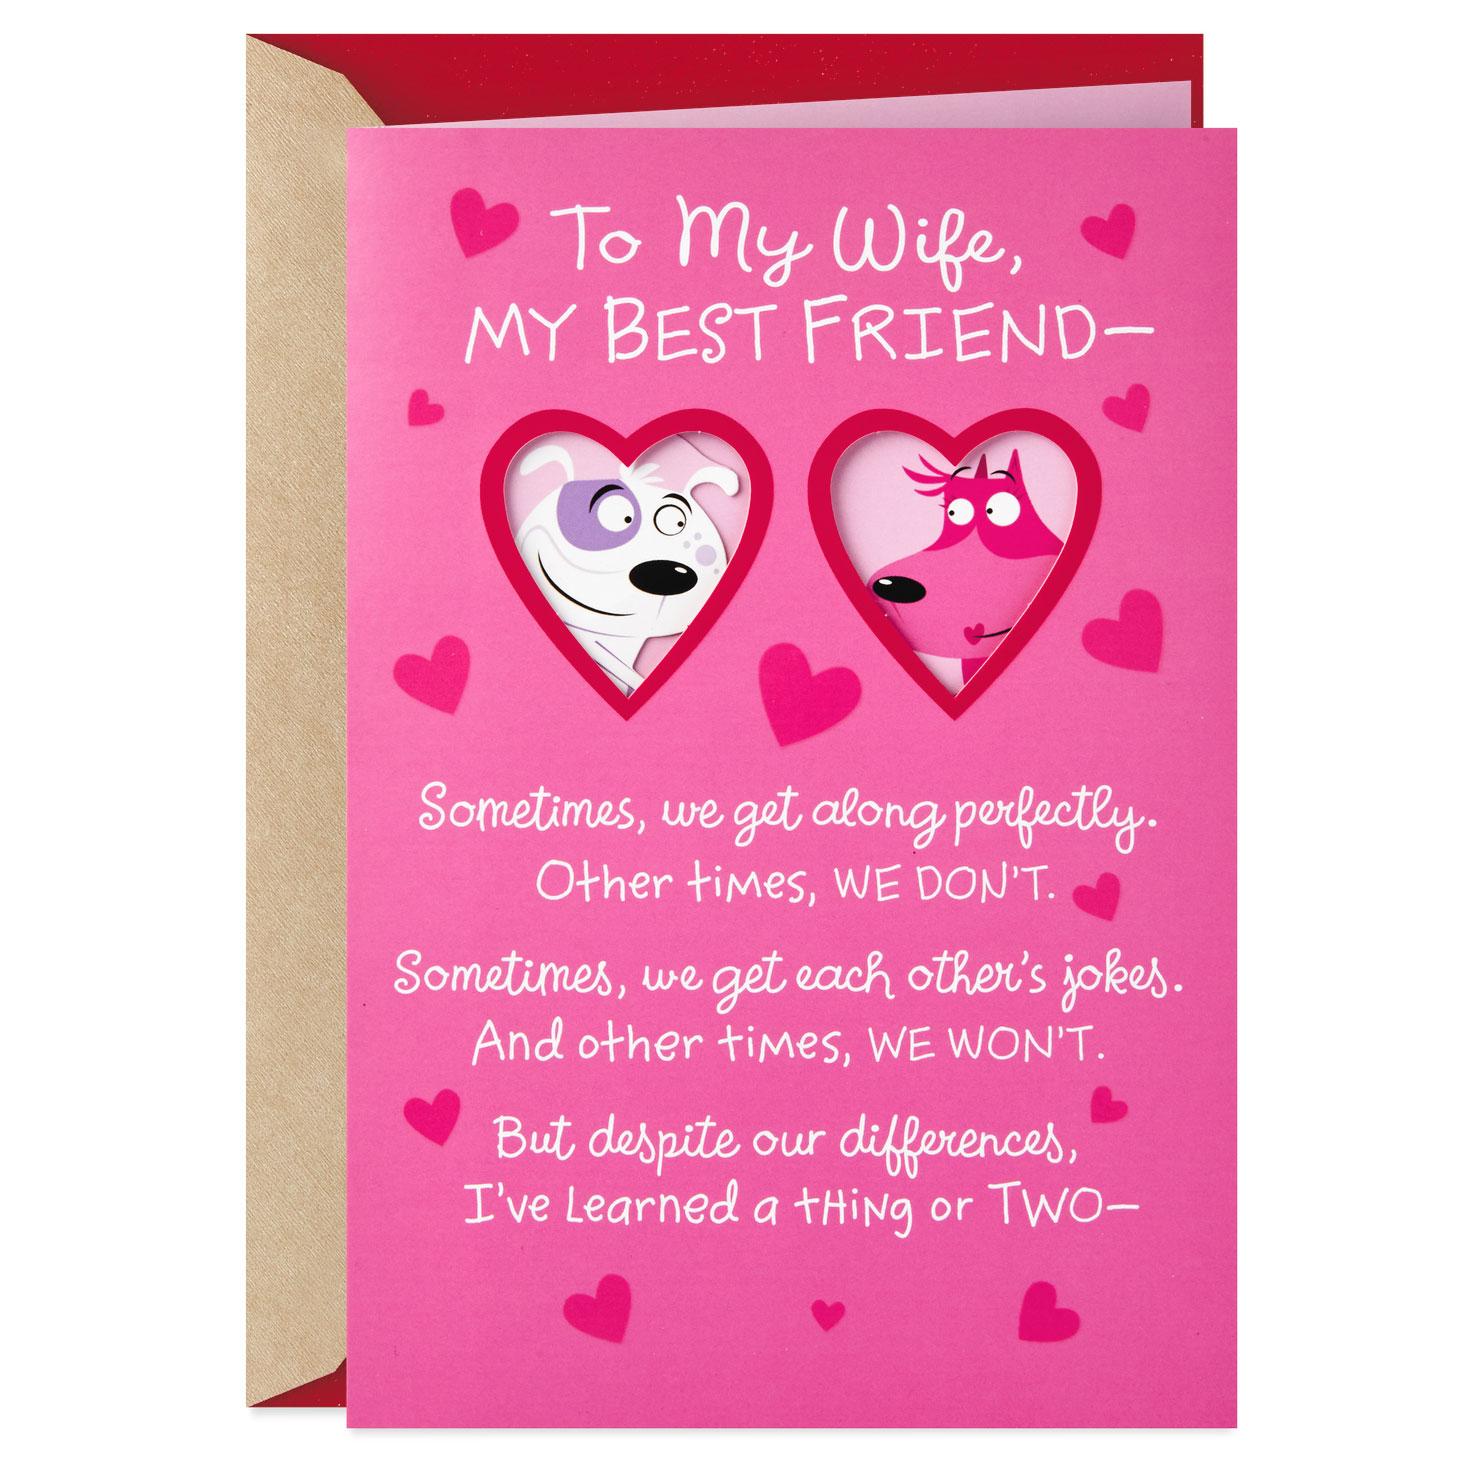 to my wife my best friend valentine's day card  greeting